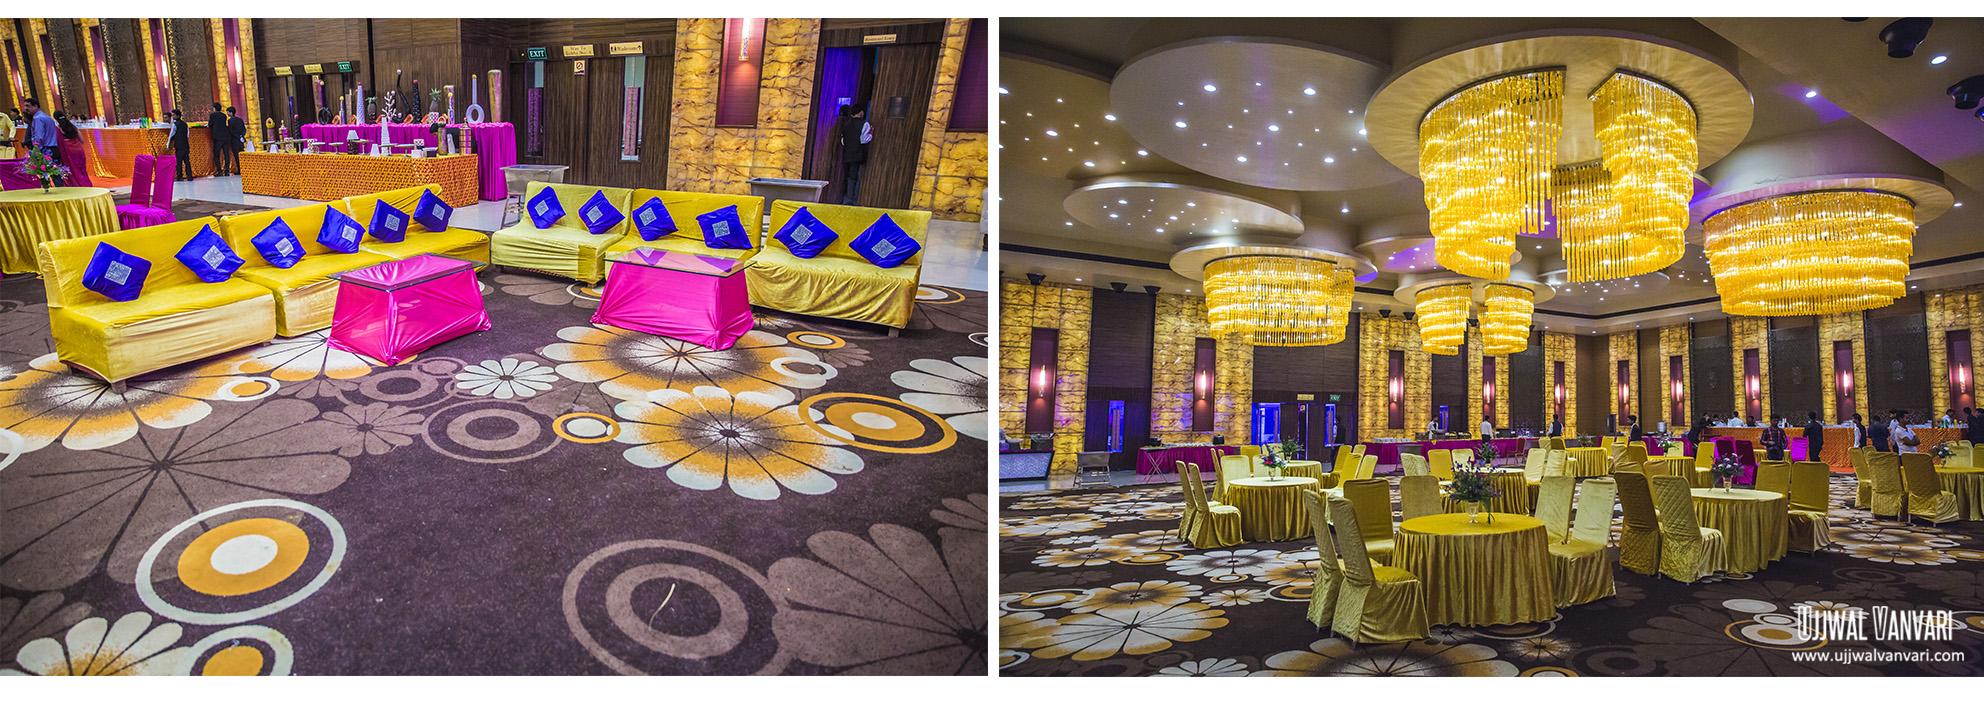 Lucknow Wedding Photography | Mannat & Rishabh Wedding | Wedding Photography